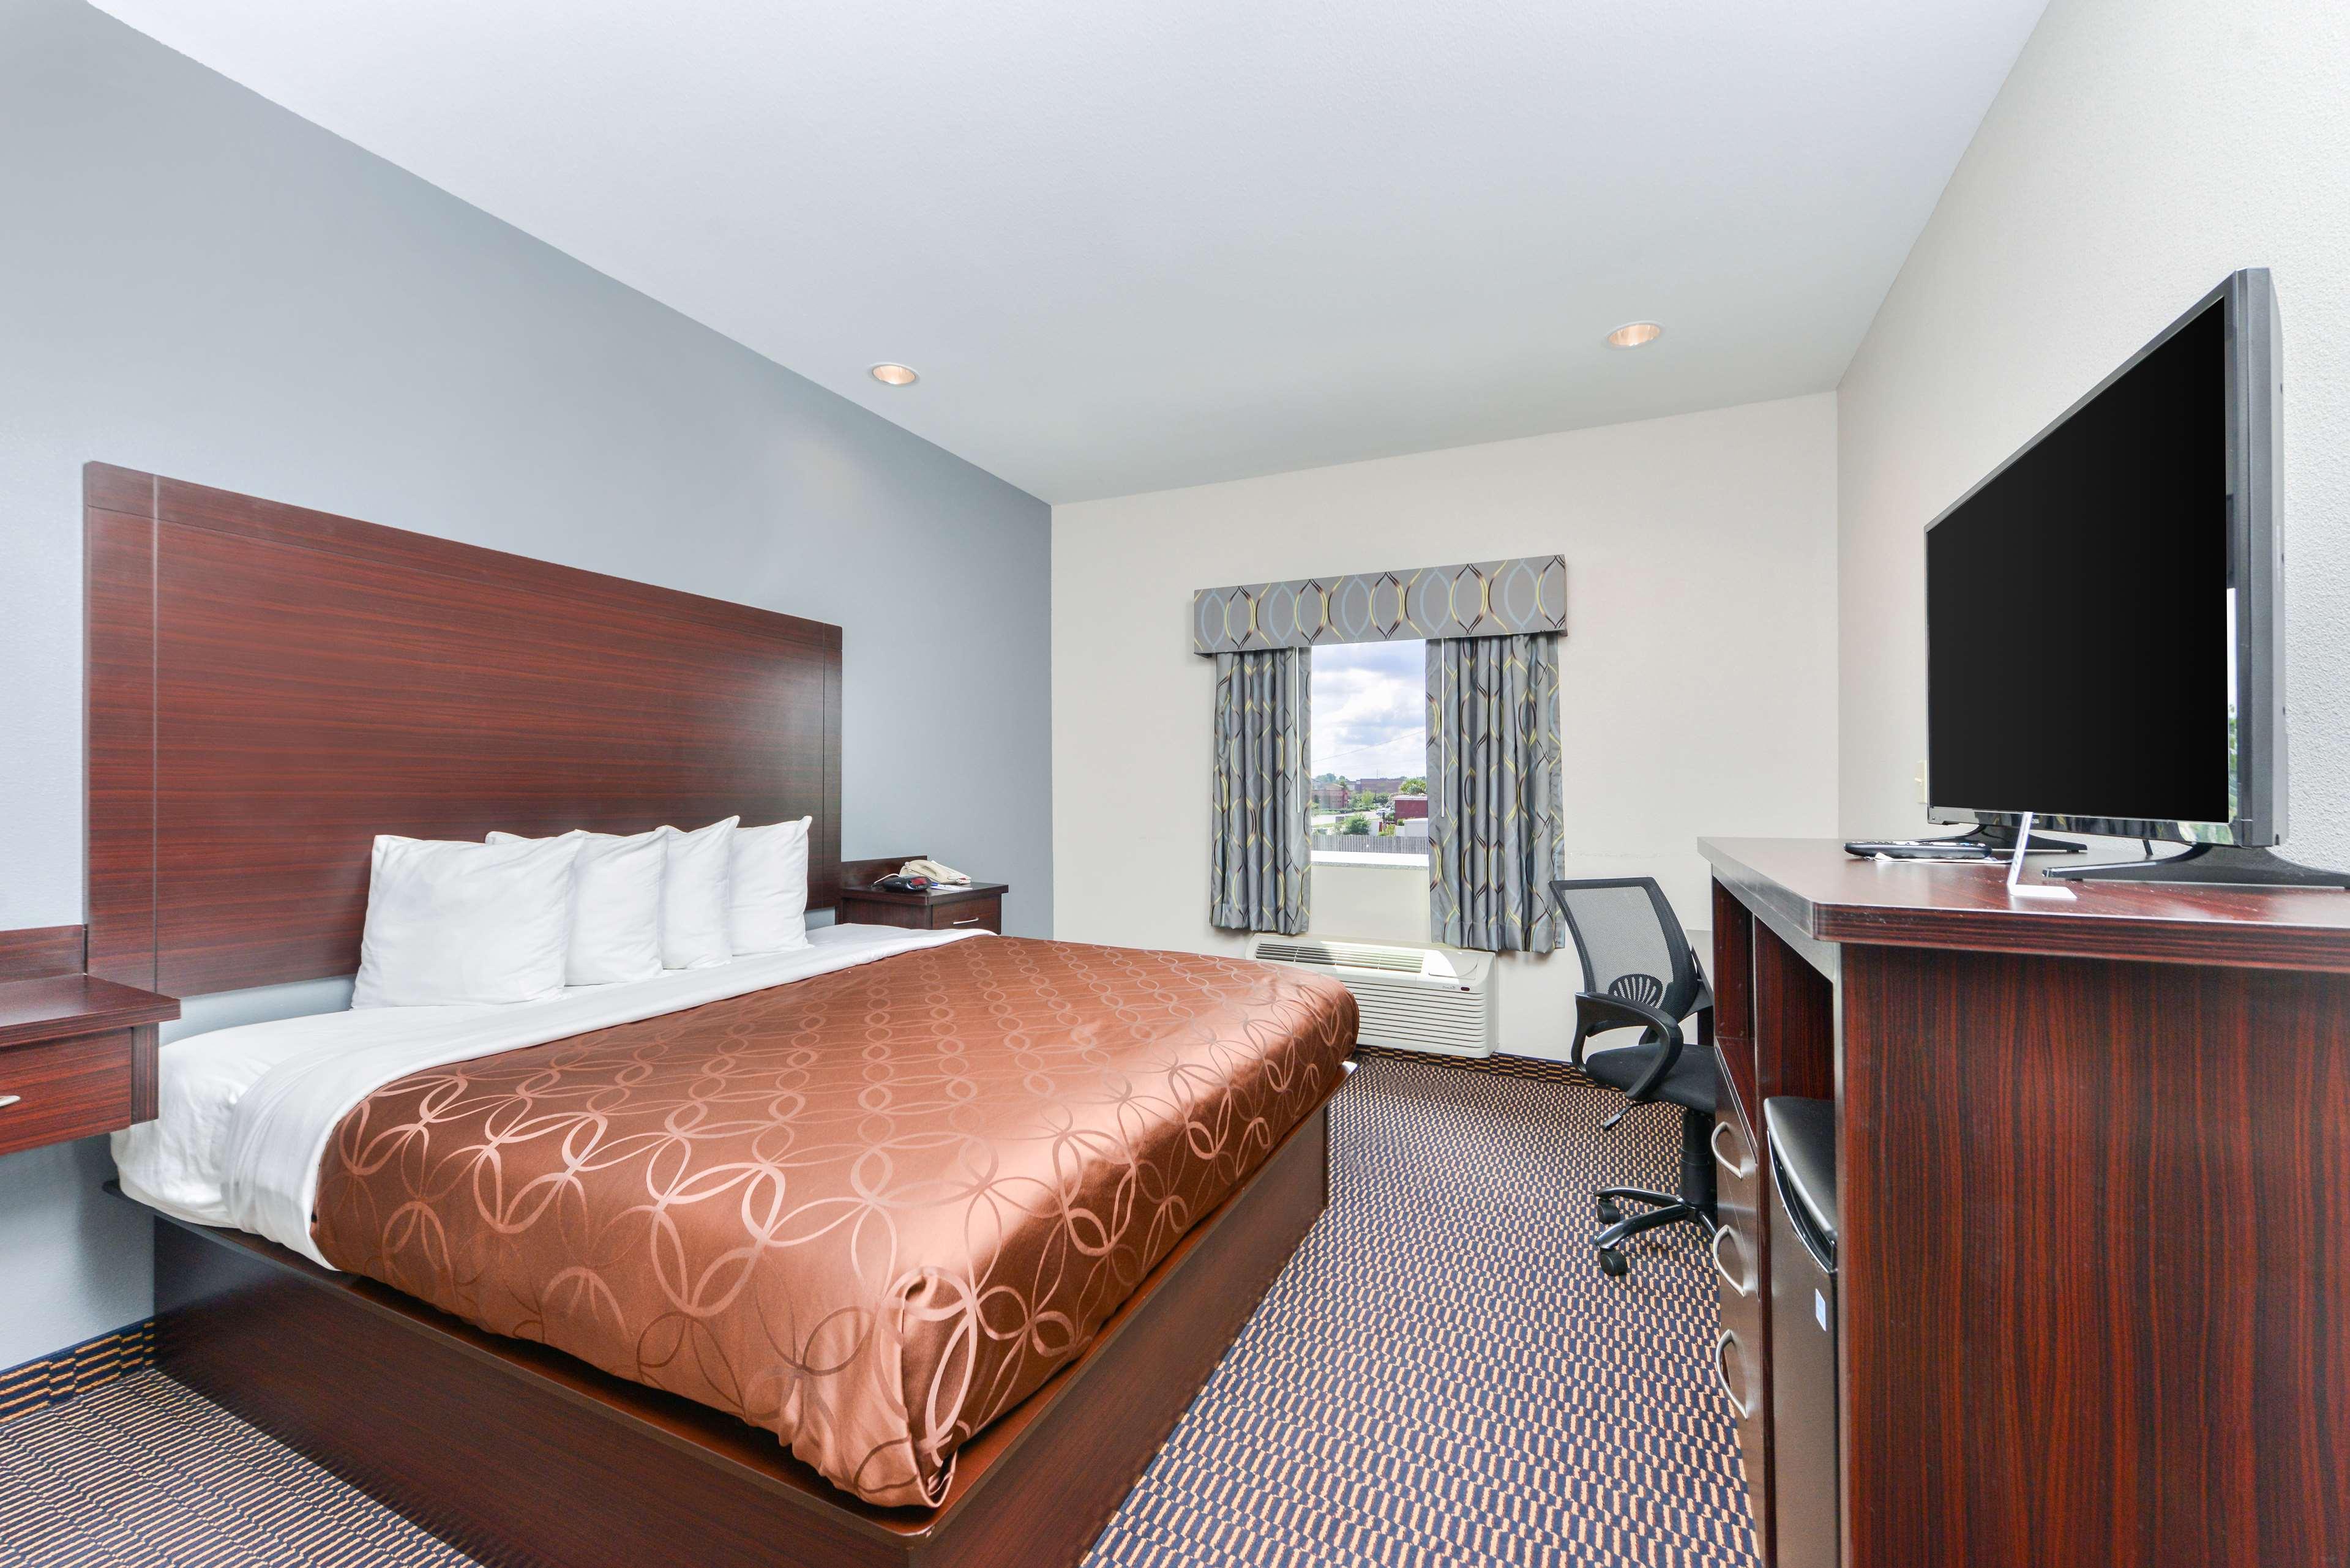 Americas Best Value Inn - Baton Rouge / College Drive image 5